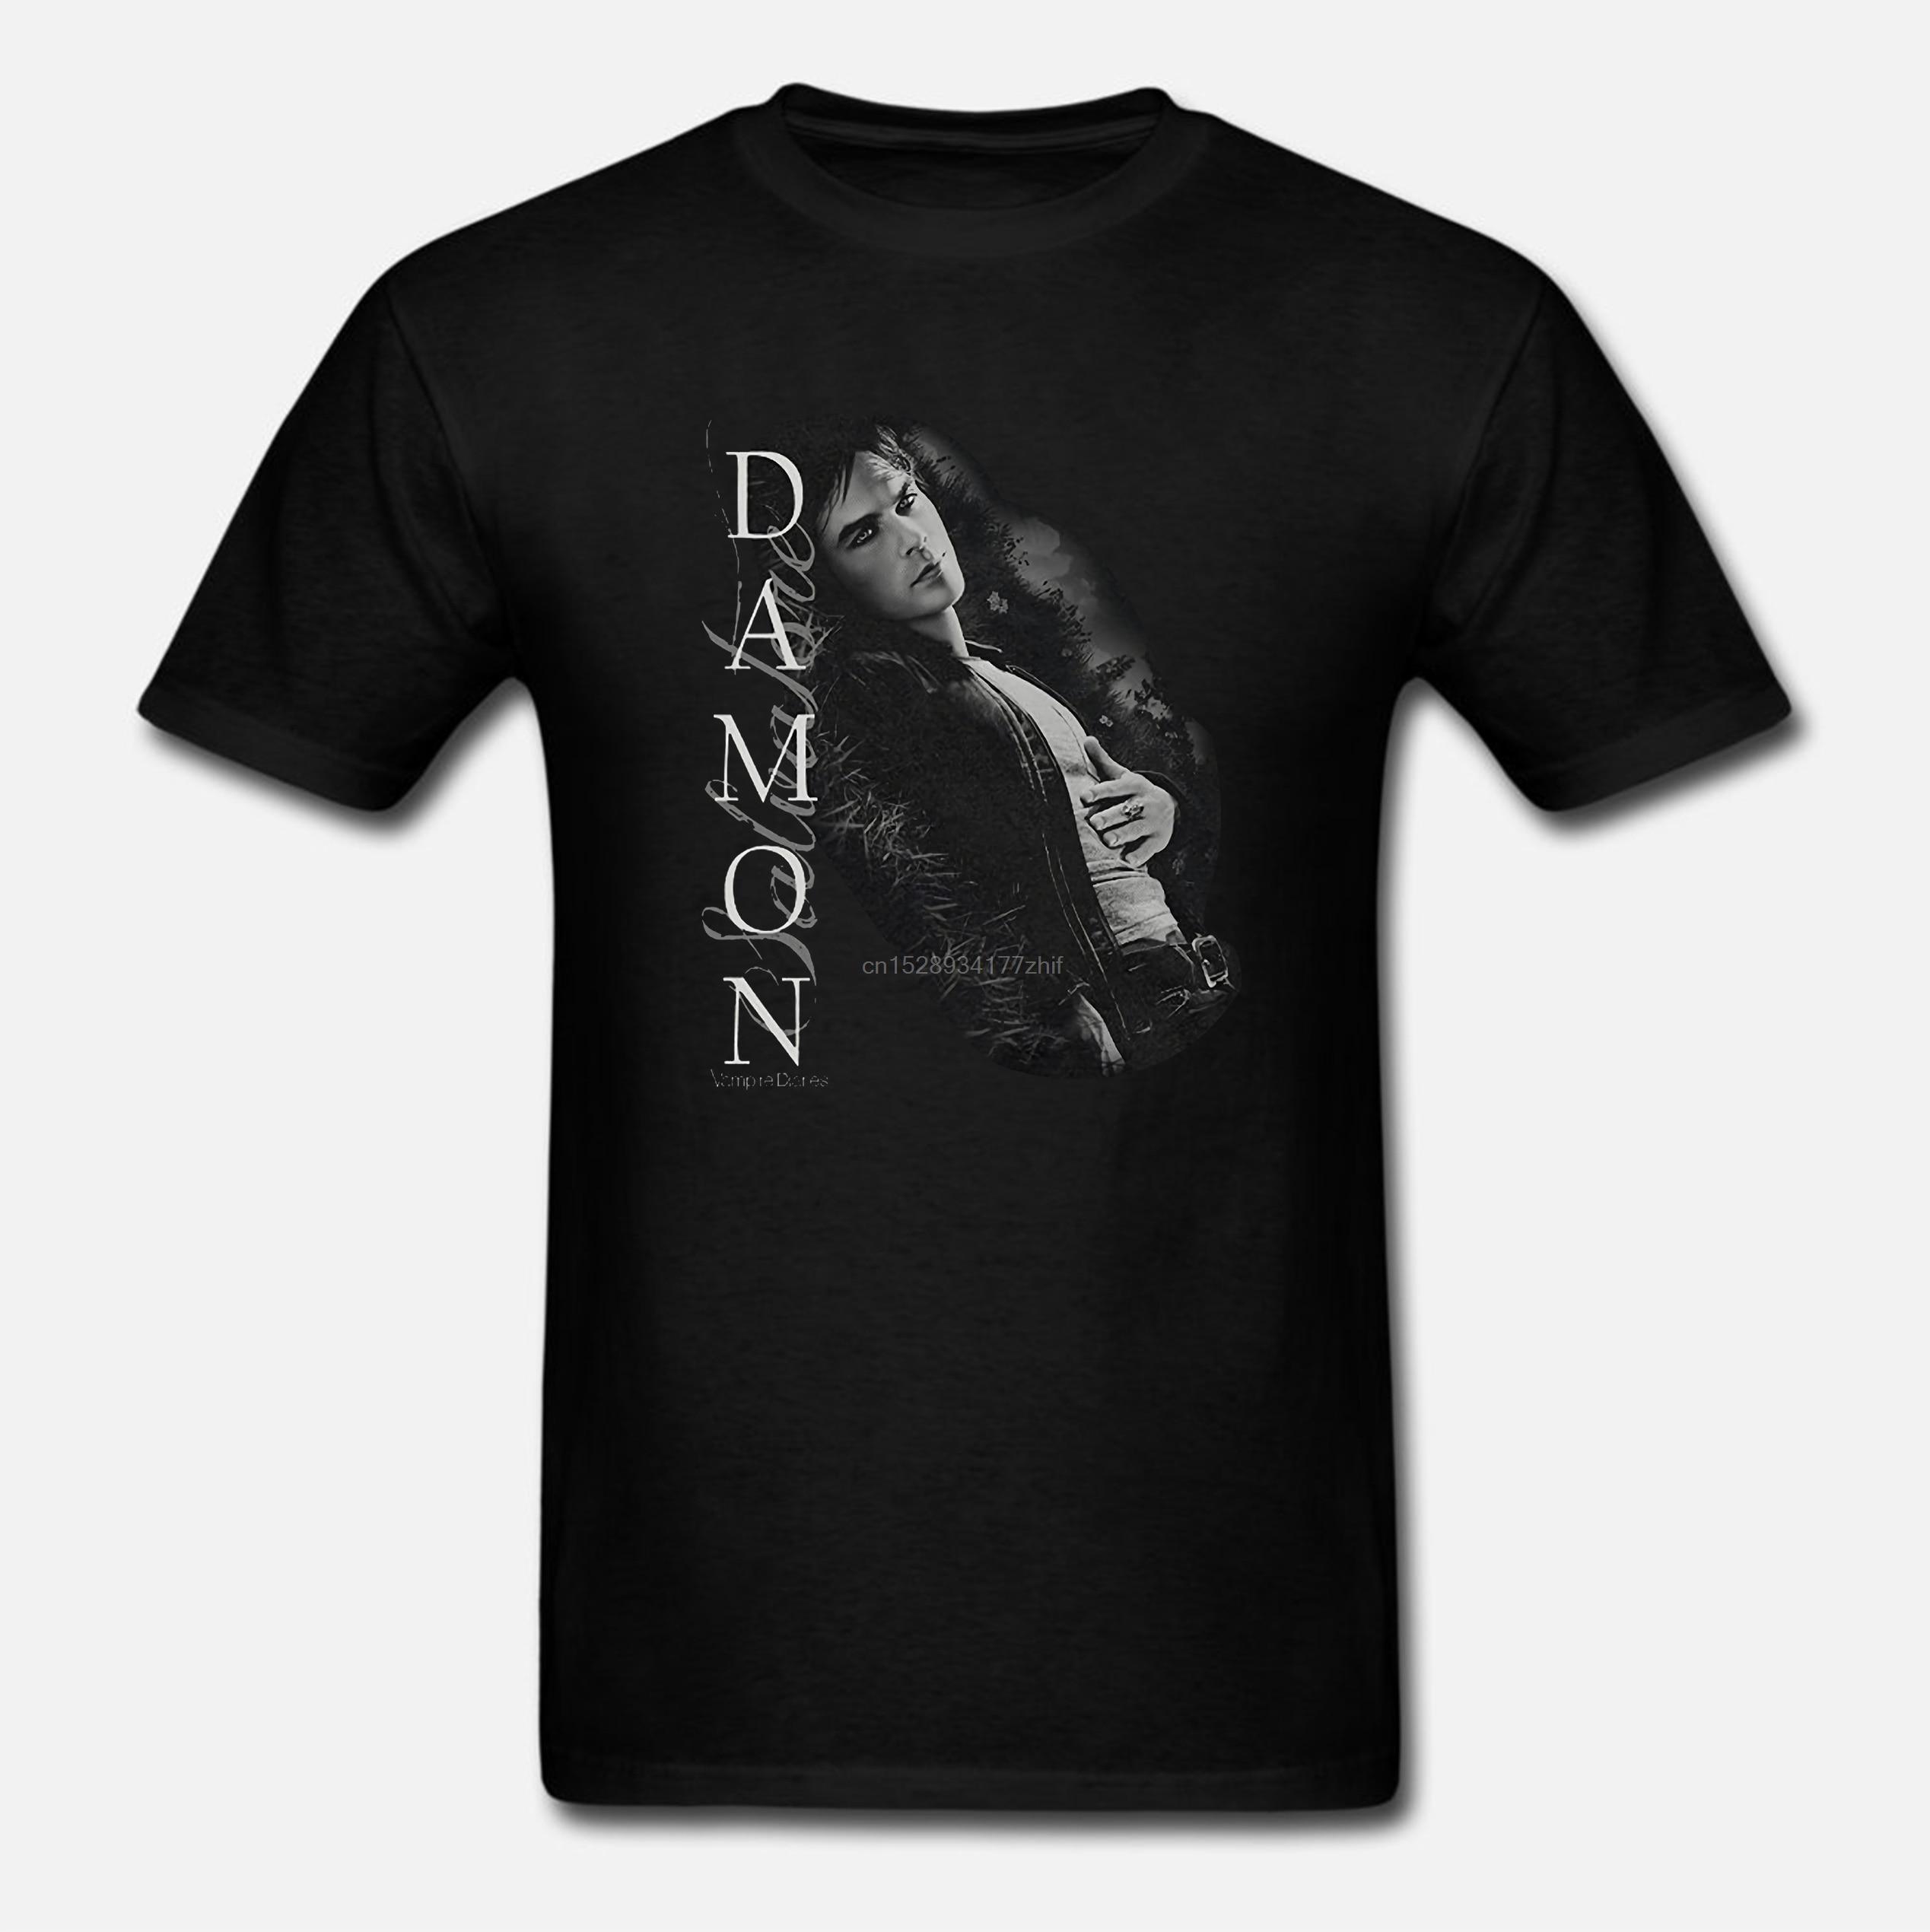 Camiseta Unisex de talla grande para hombre con diseño de vampiro, Drama sobrenatural, programa de televisión, Damon Salvatore